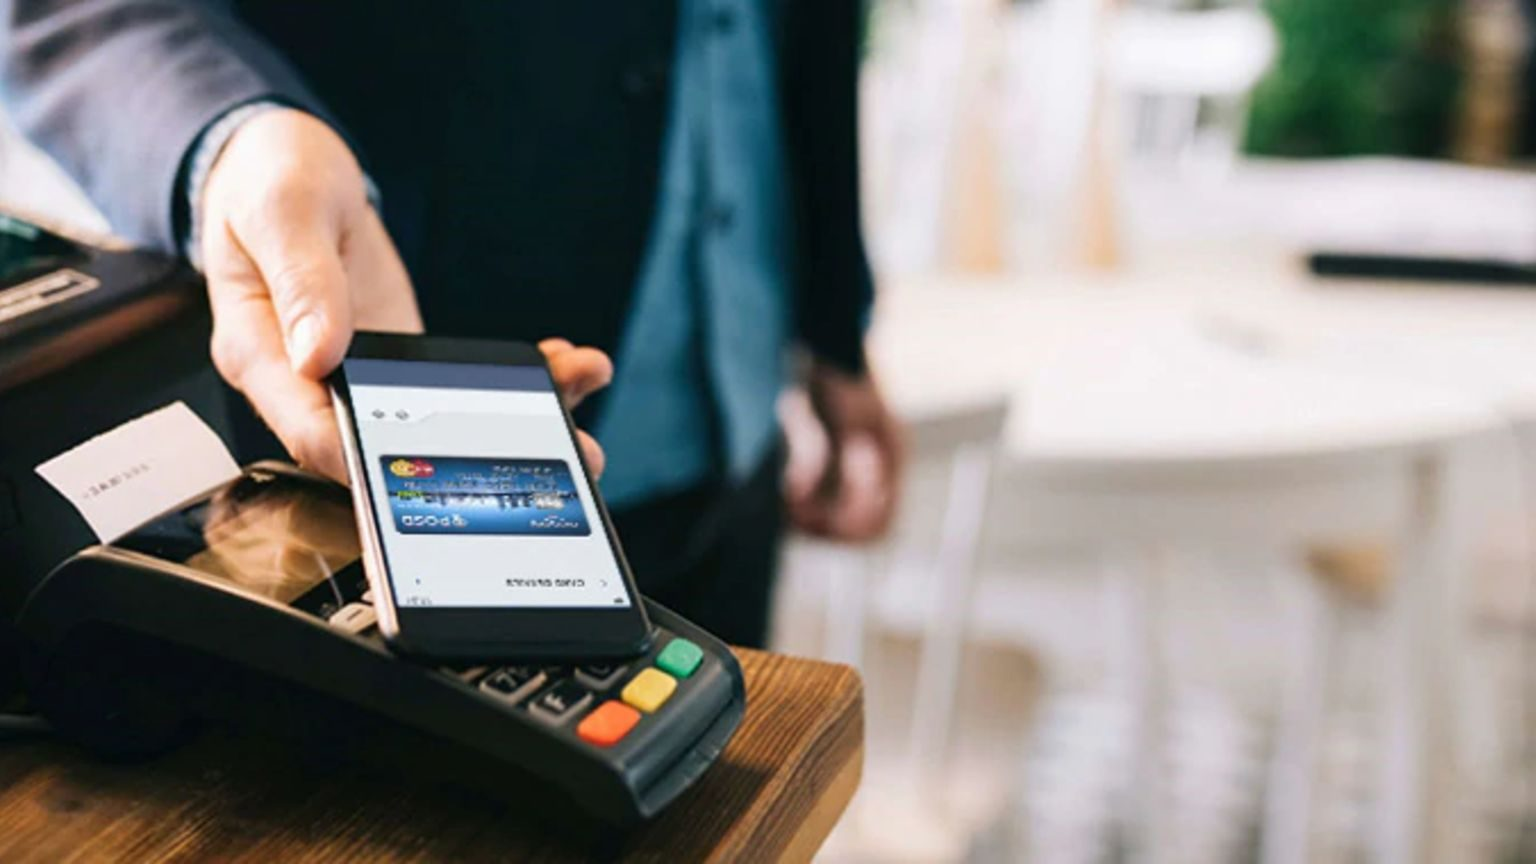 POSB Mobile Payment